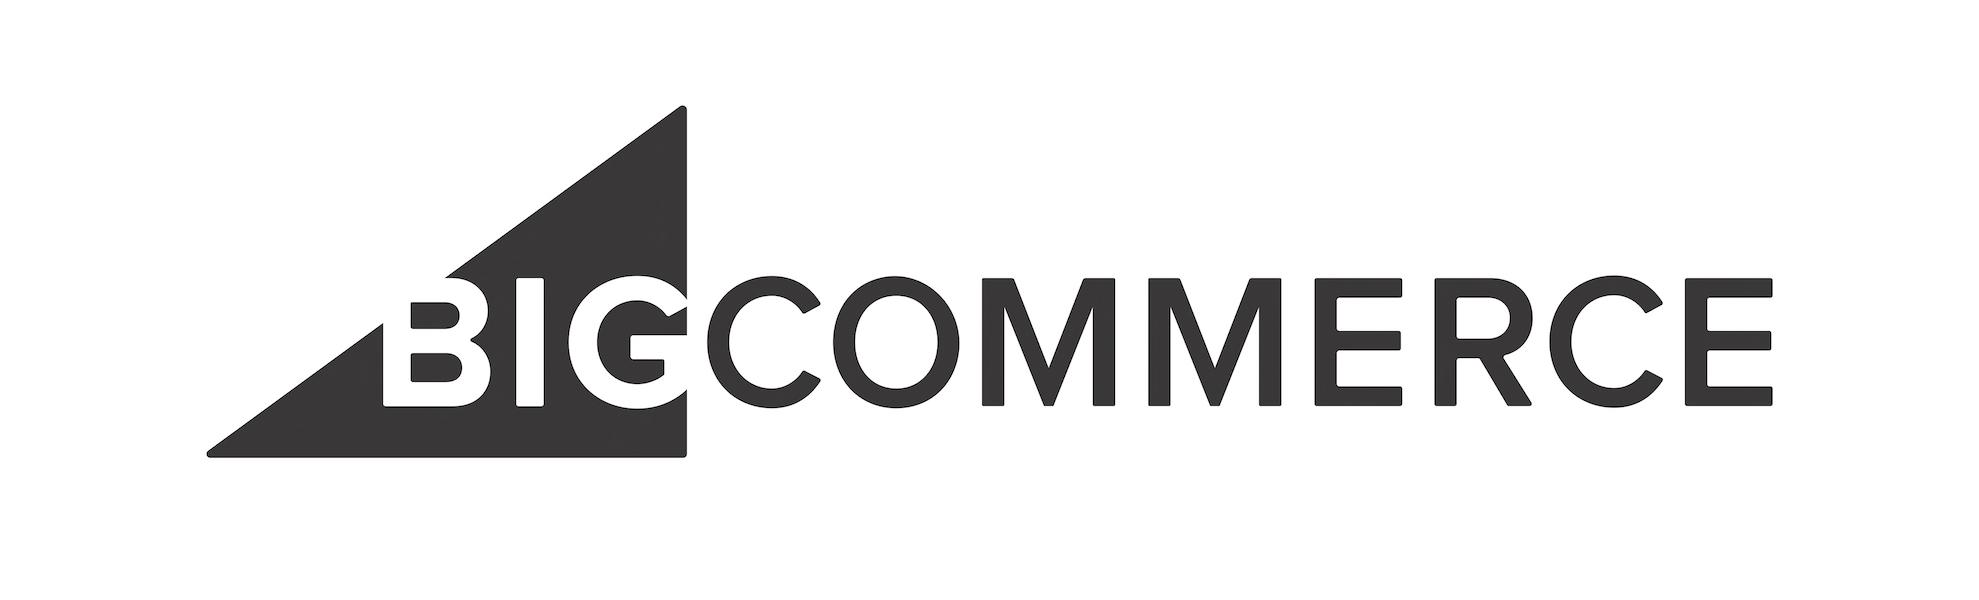 BigCommerce-1920x600